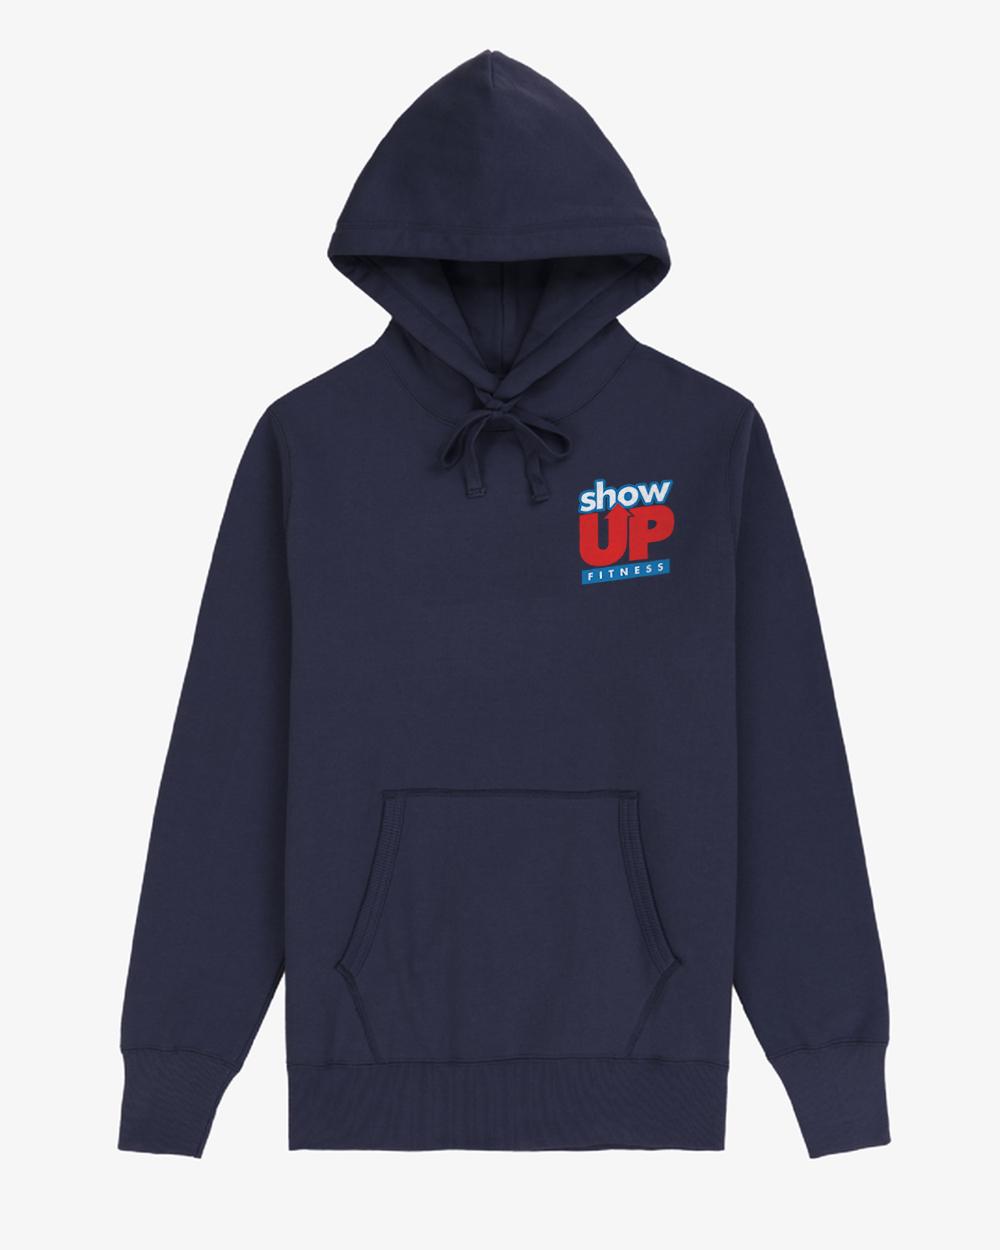 Unisex Pullover Sweater (Navy).jpg